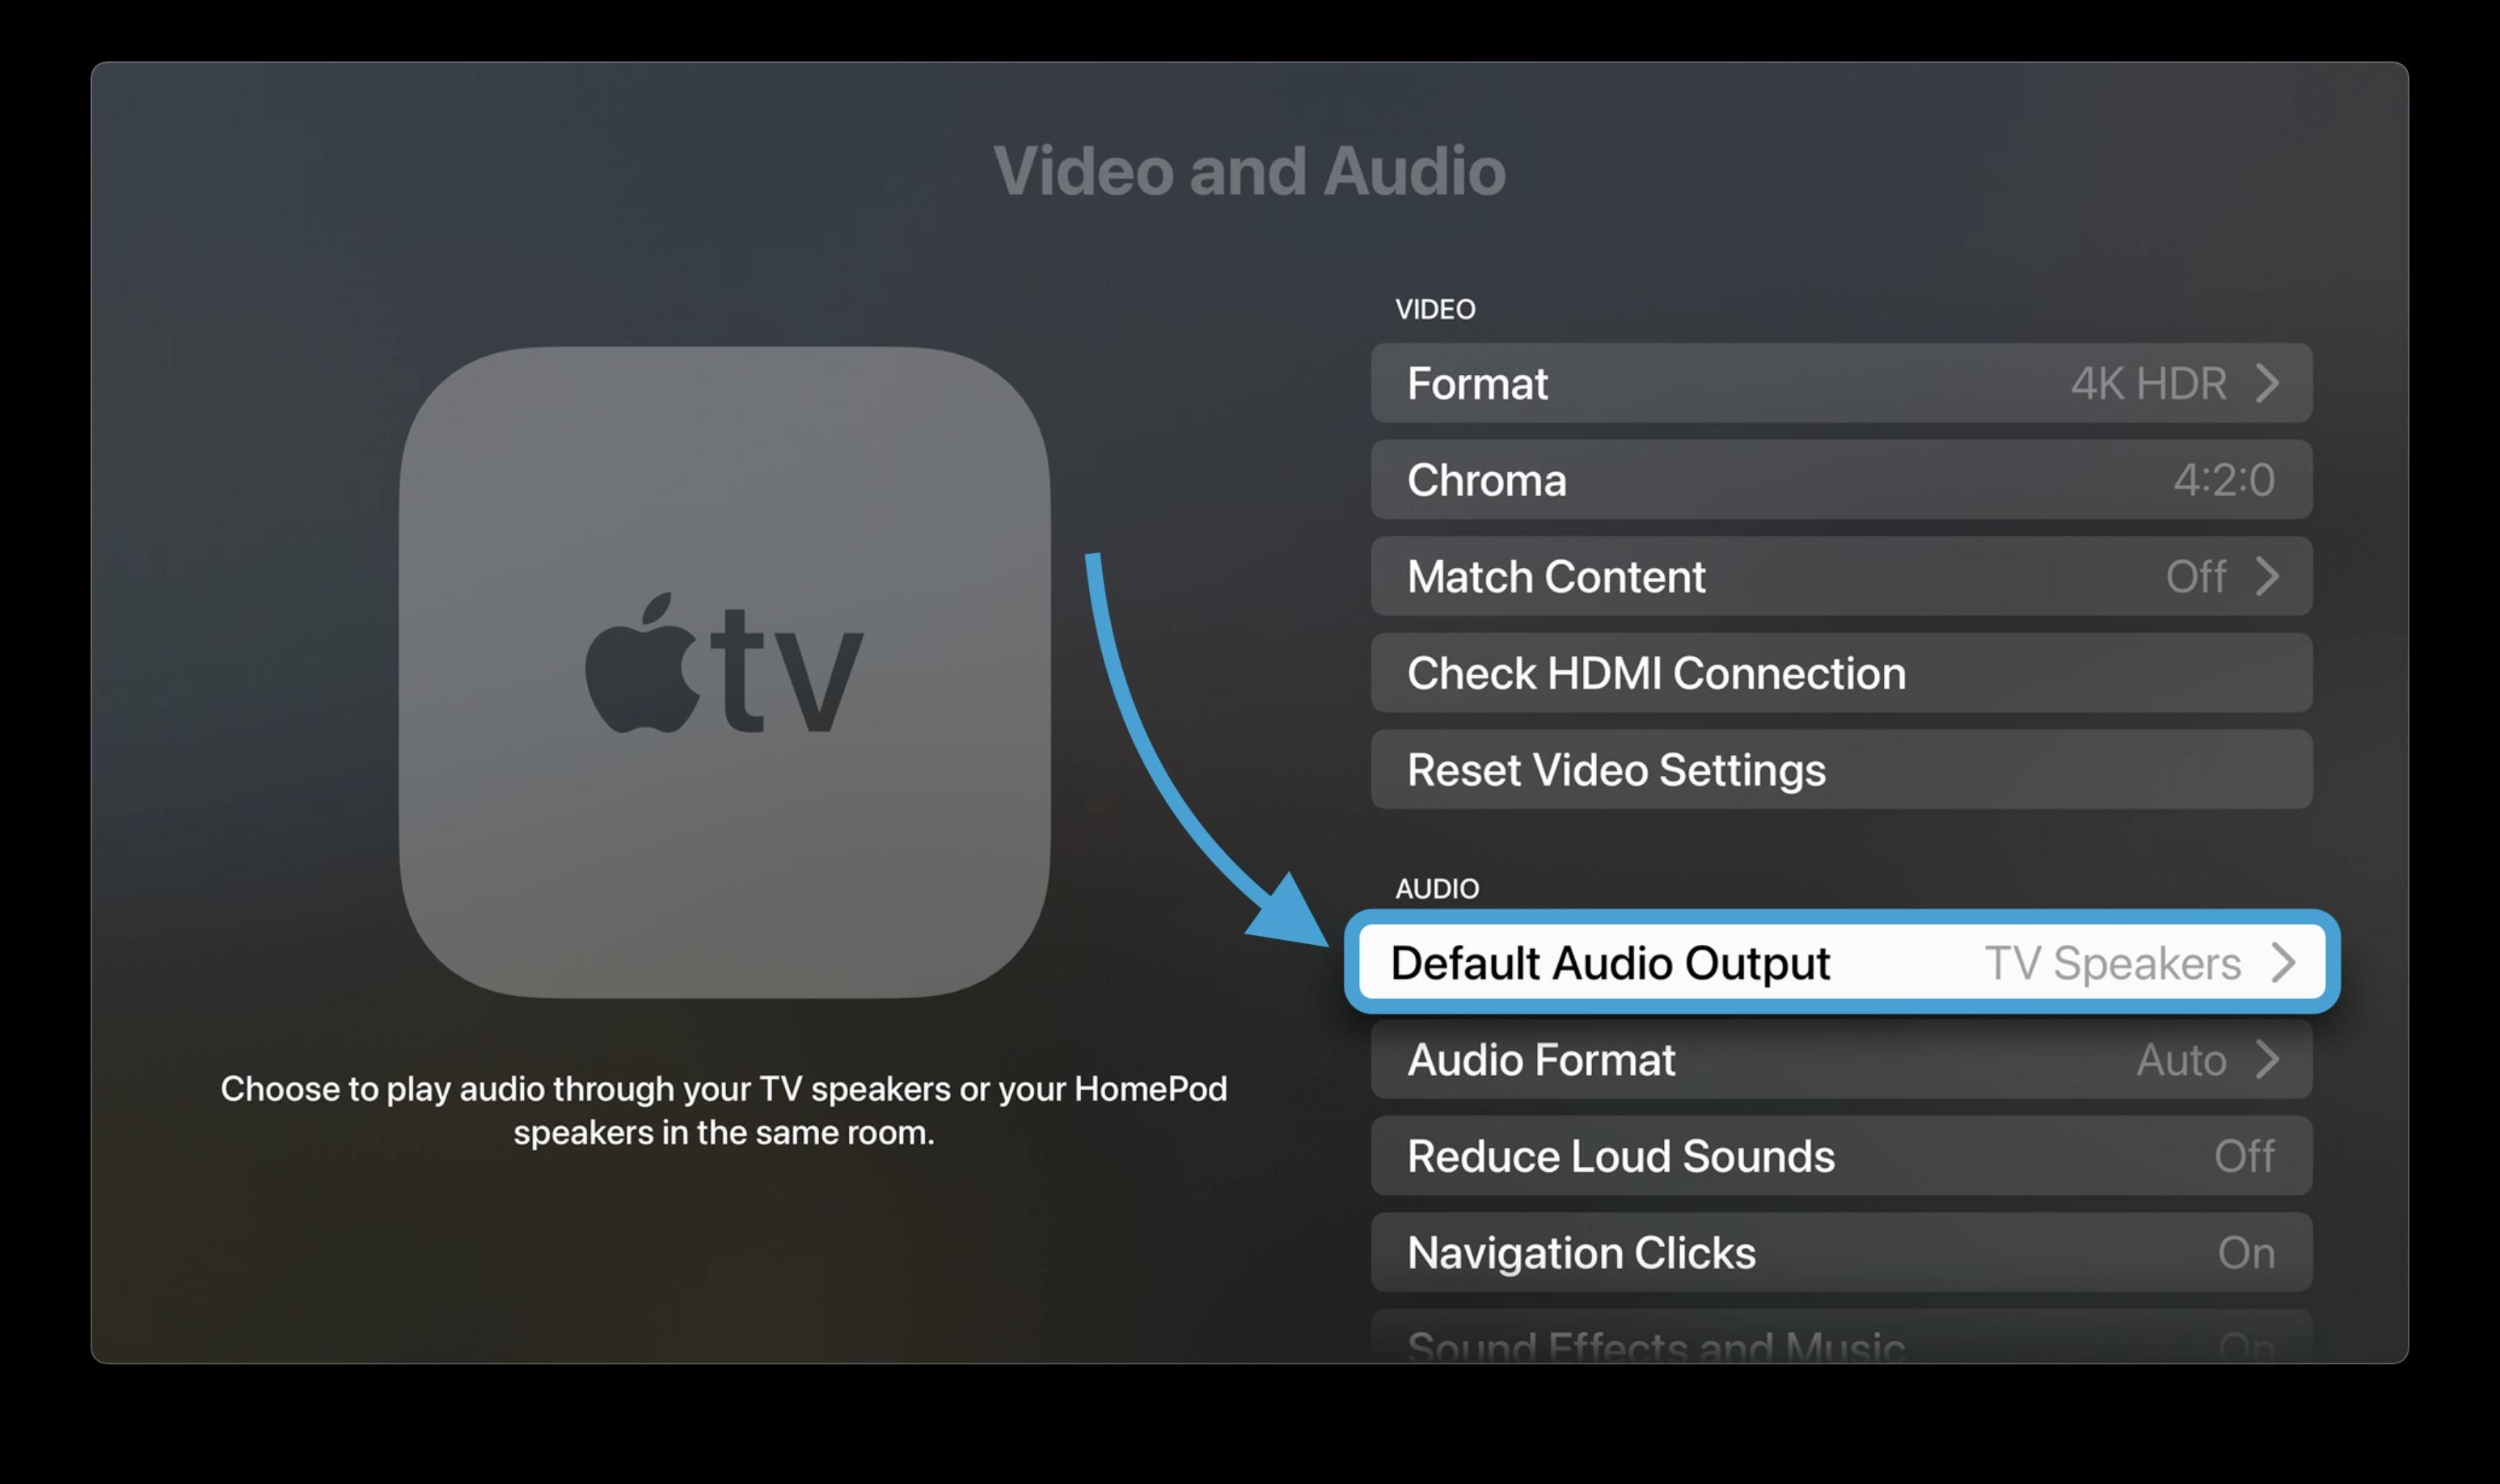 How to set HomePod as Apple TV default speakers walkthrough 2 - Choose Default Audio Output